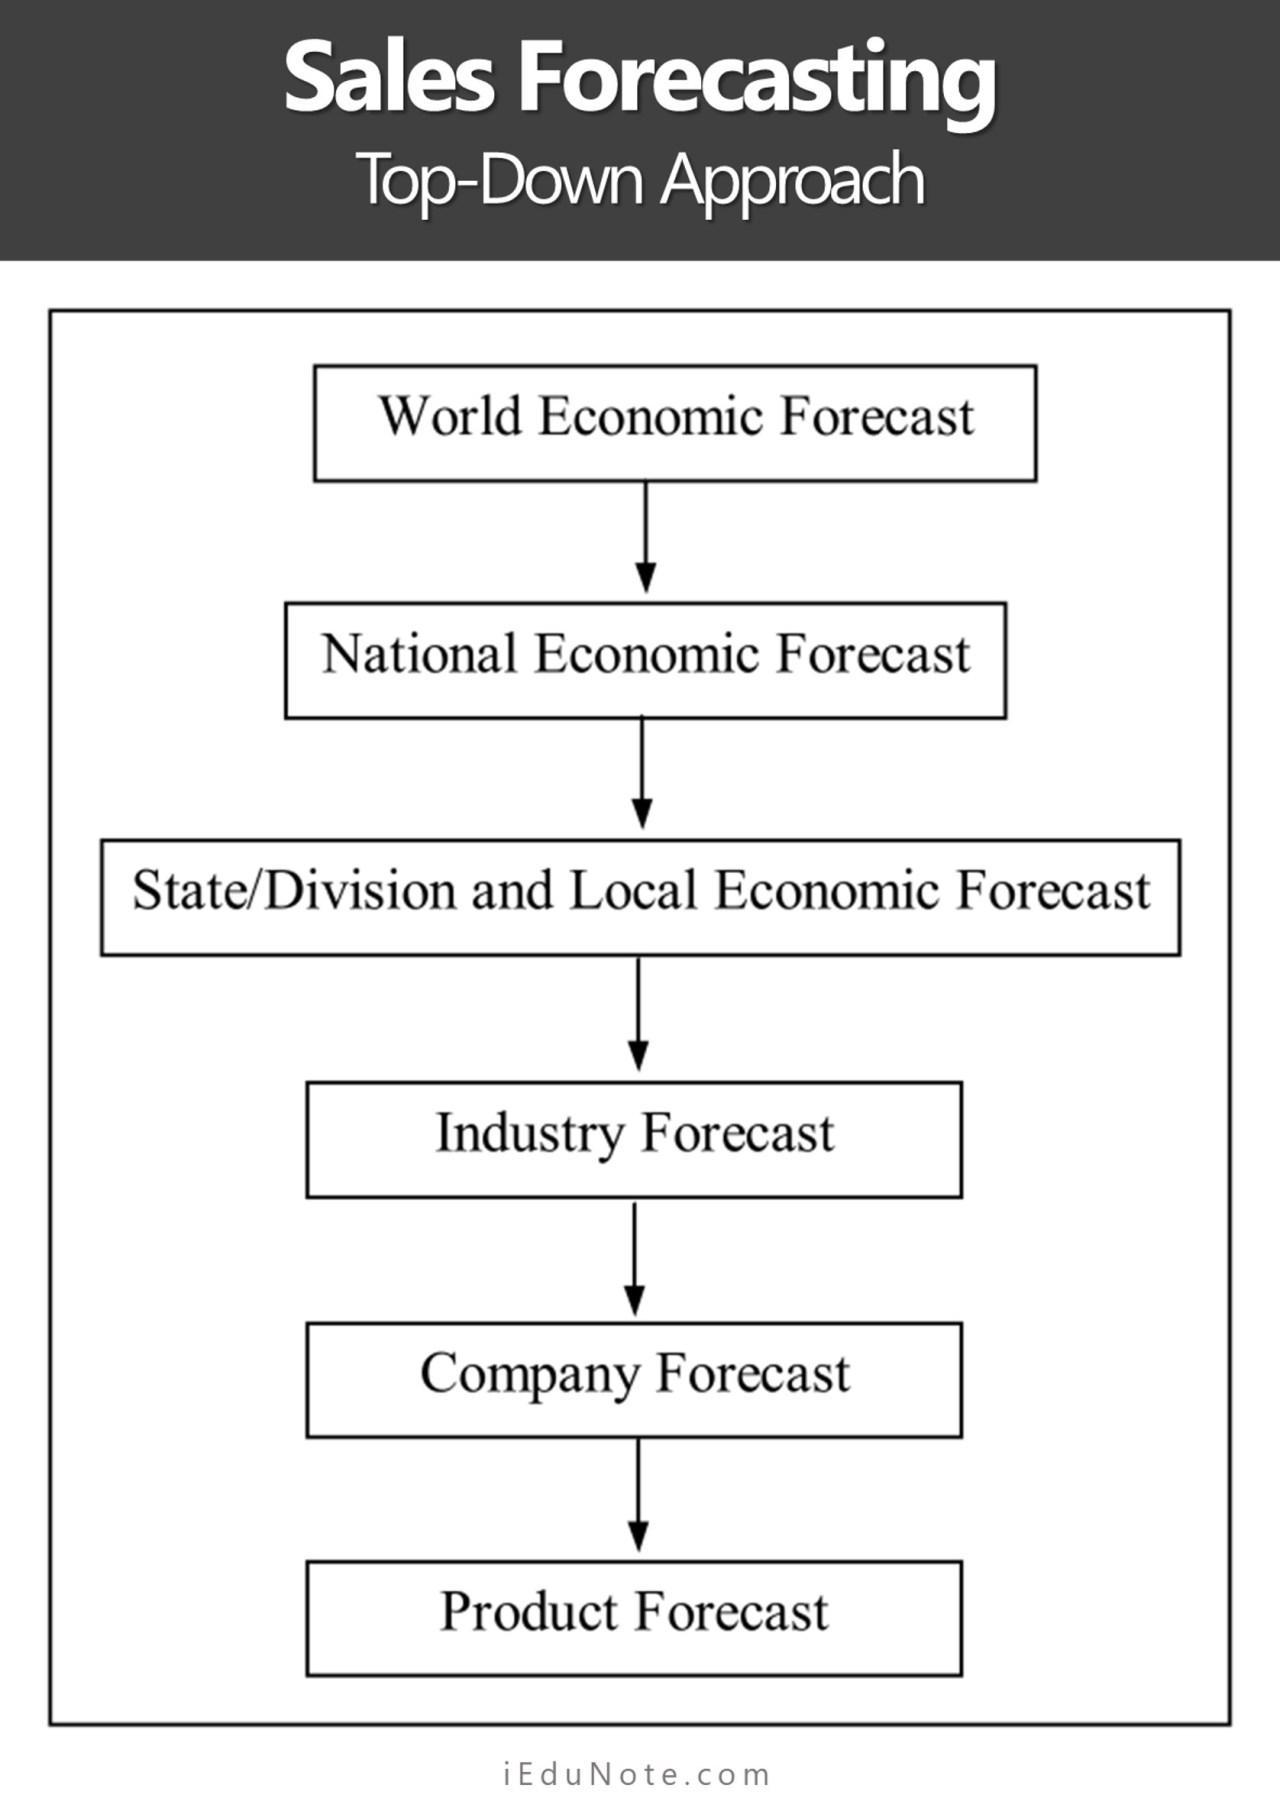 Sales Forecasting Levels